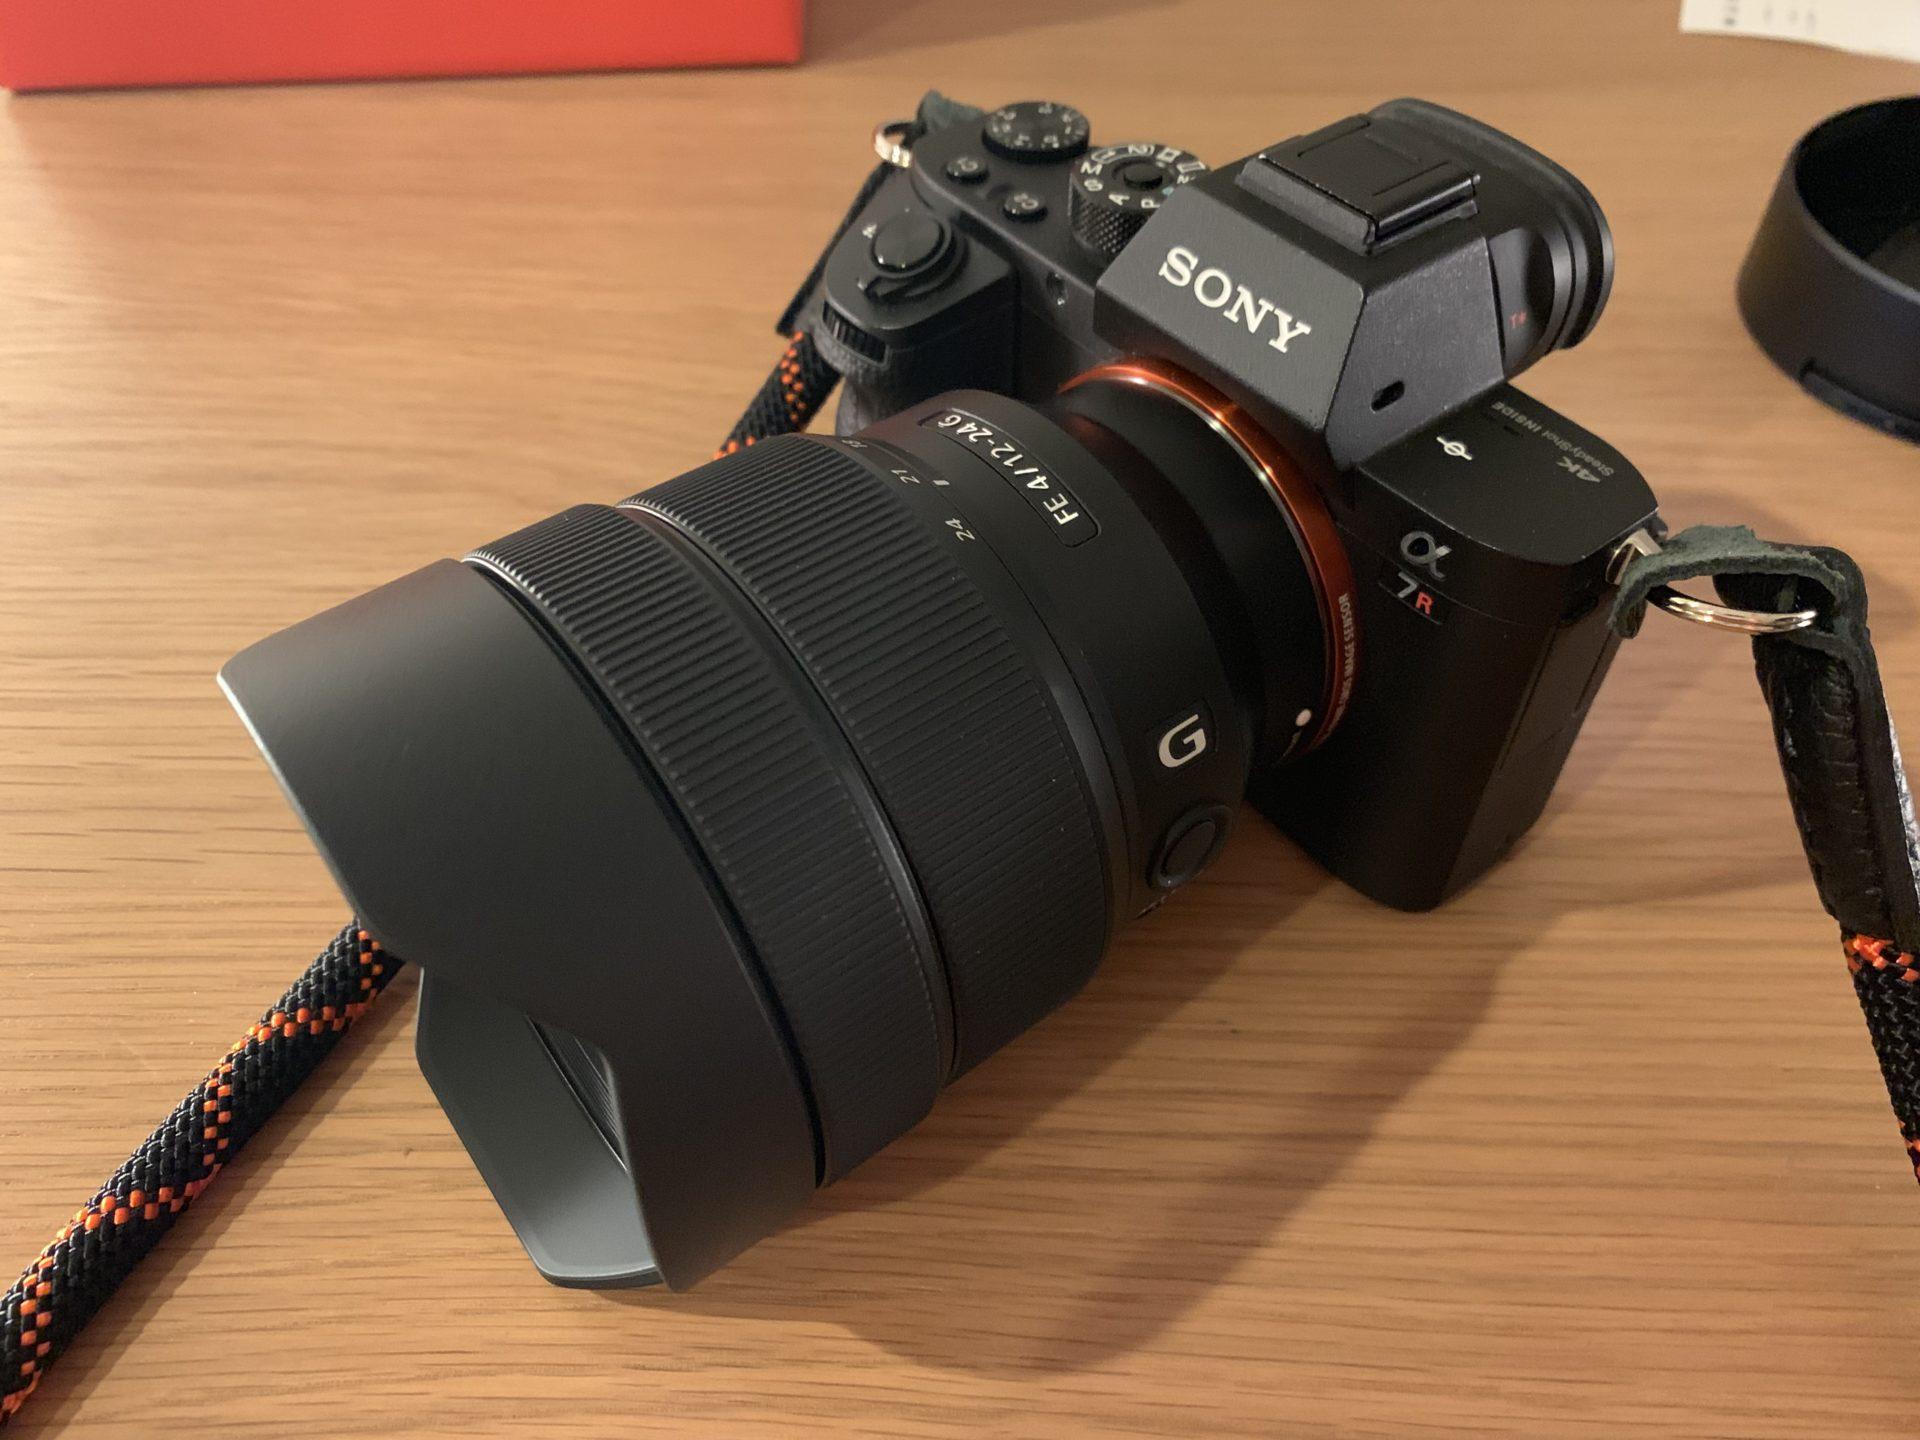 SEL1224G SONY αシリーズ超広角レンズ